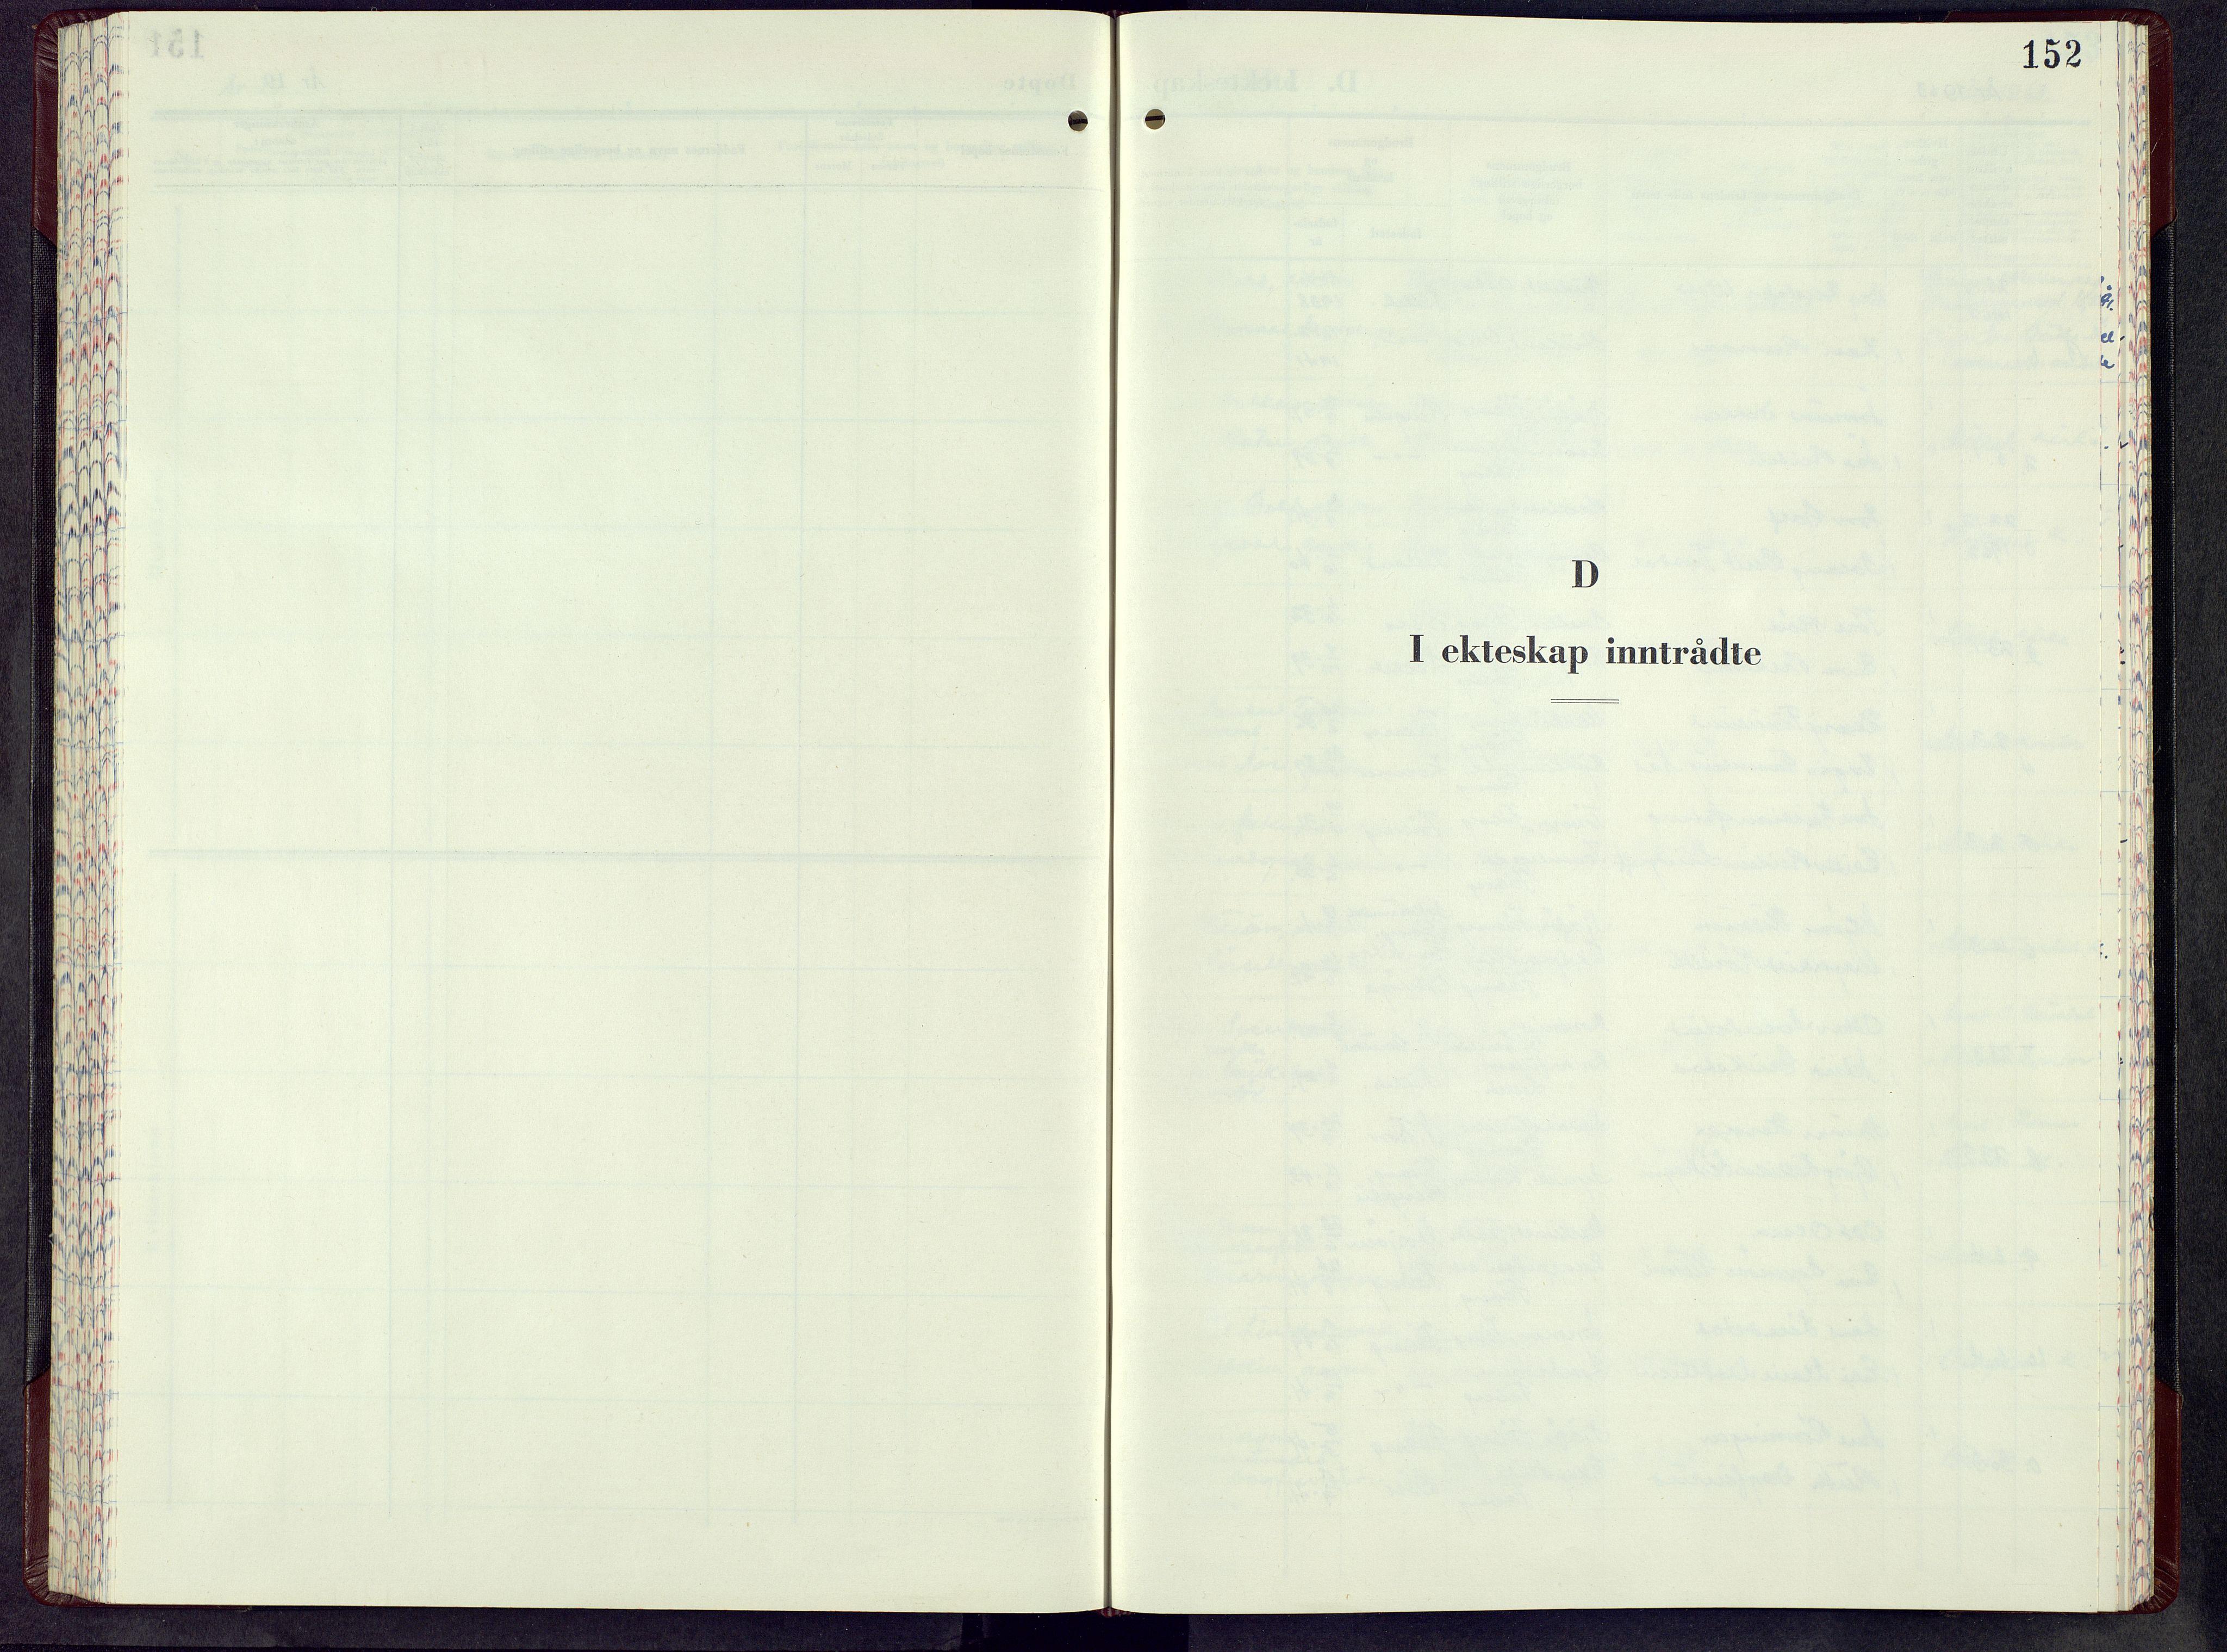 SAH, Fåberg prestekontor, H/Ha/Hab/L0020: Parish register (copy) no. 20, 1961-1968, p. 152